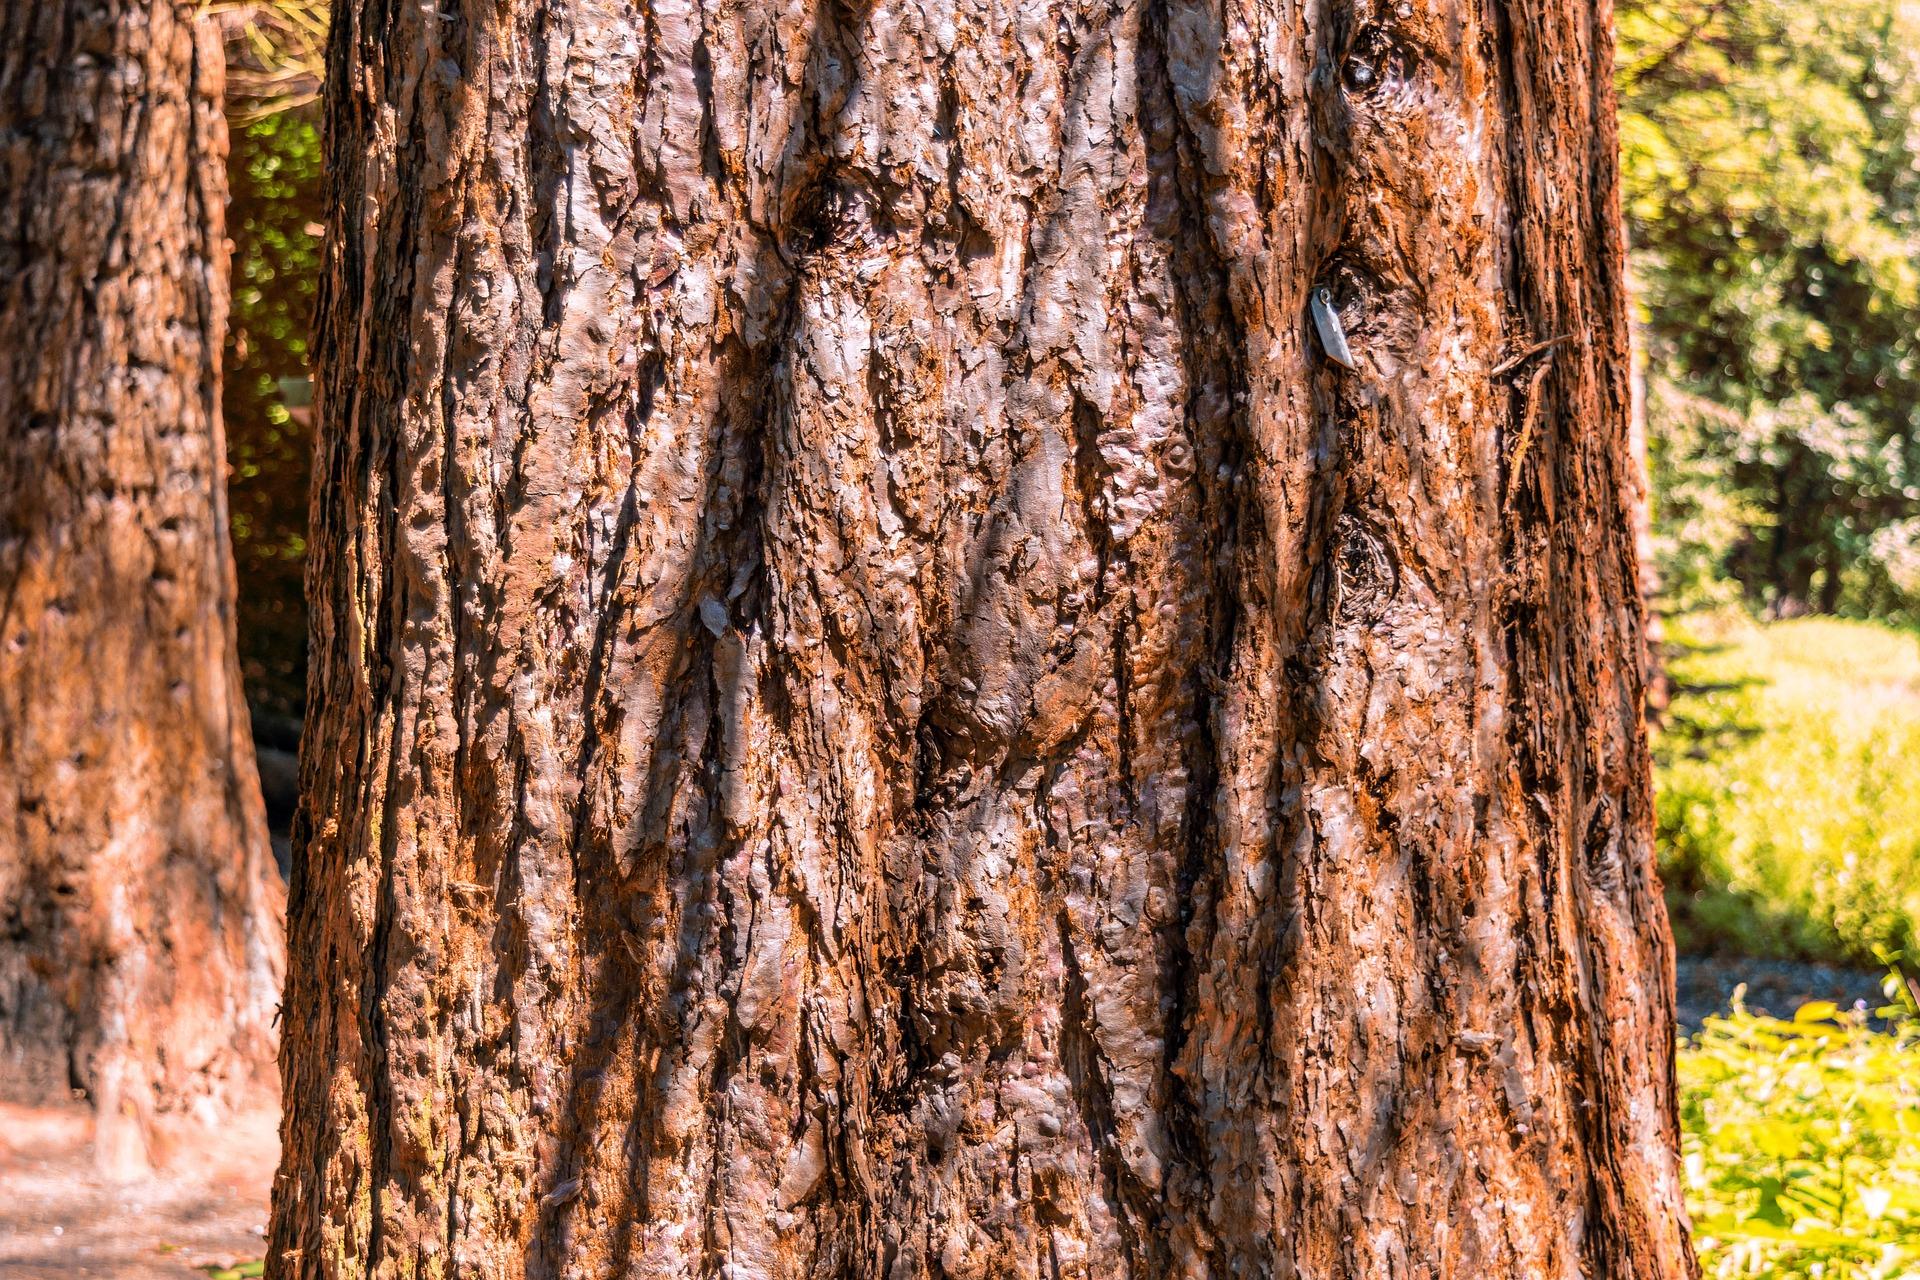 Wooden Texture, Cut, Log, Texture, Tree, HQ Photo